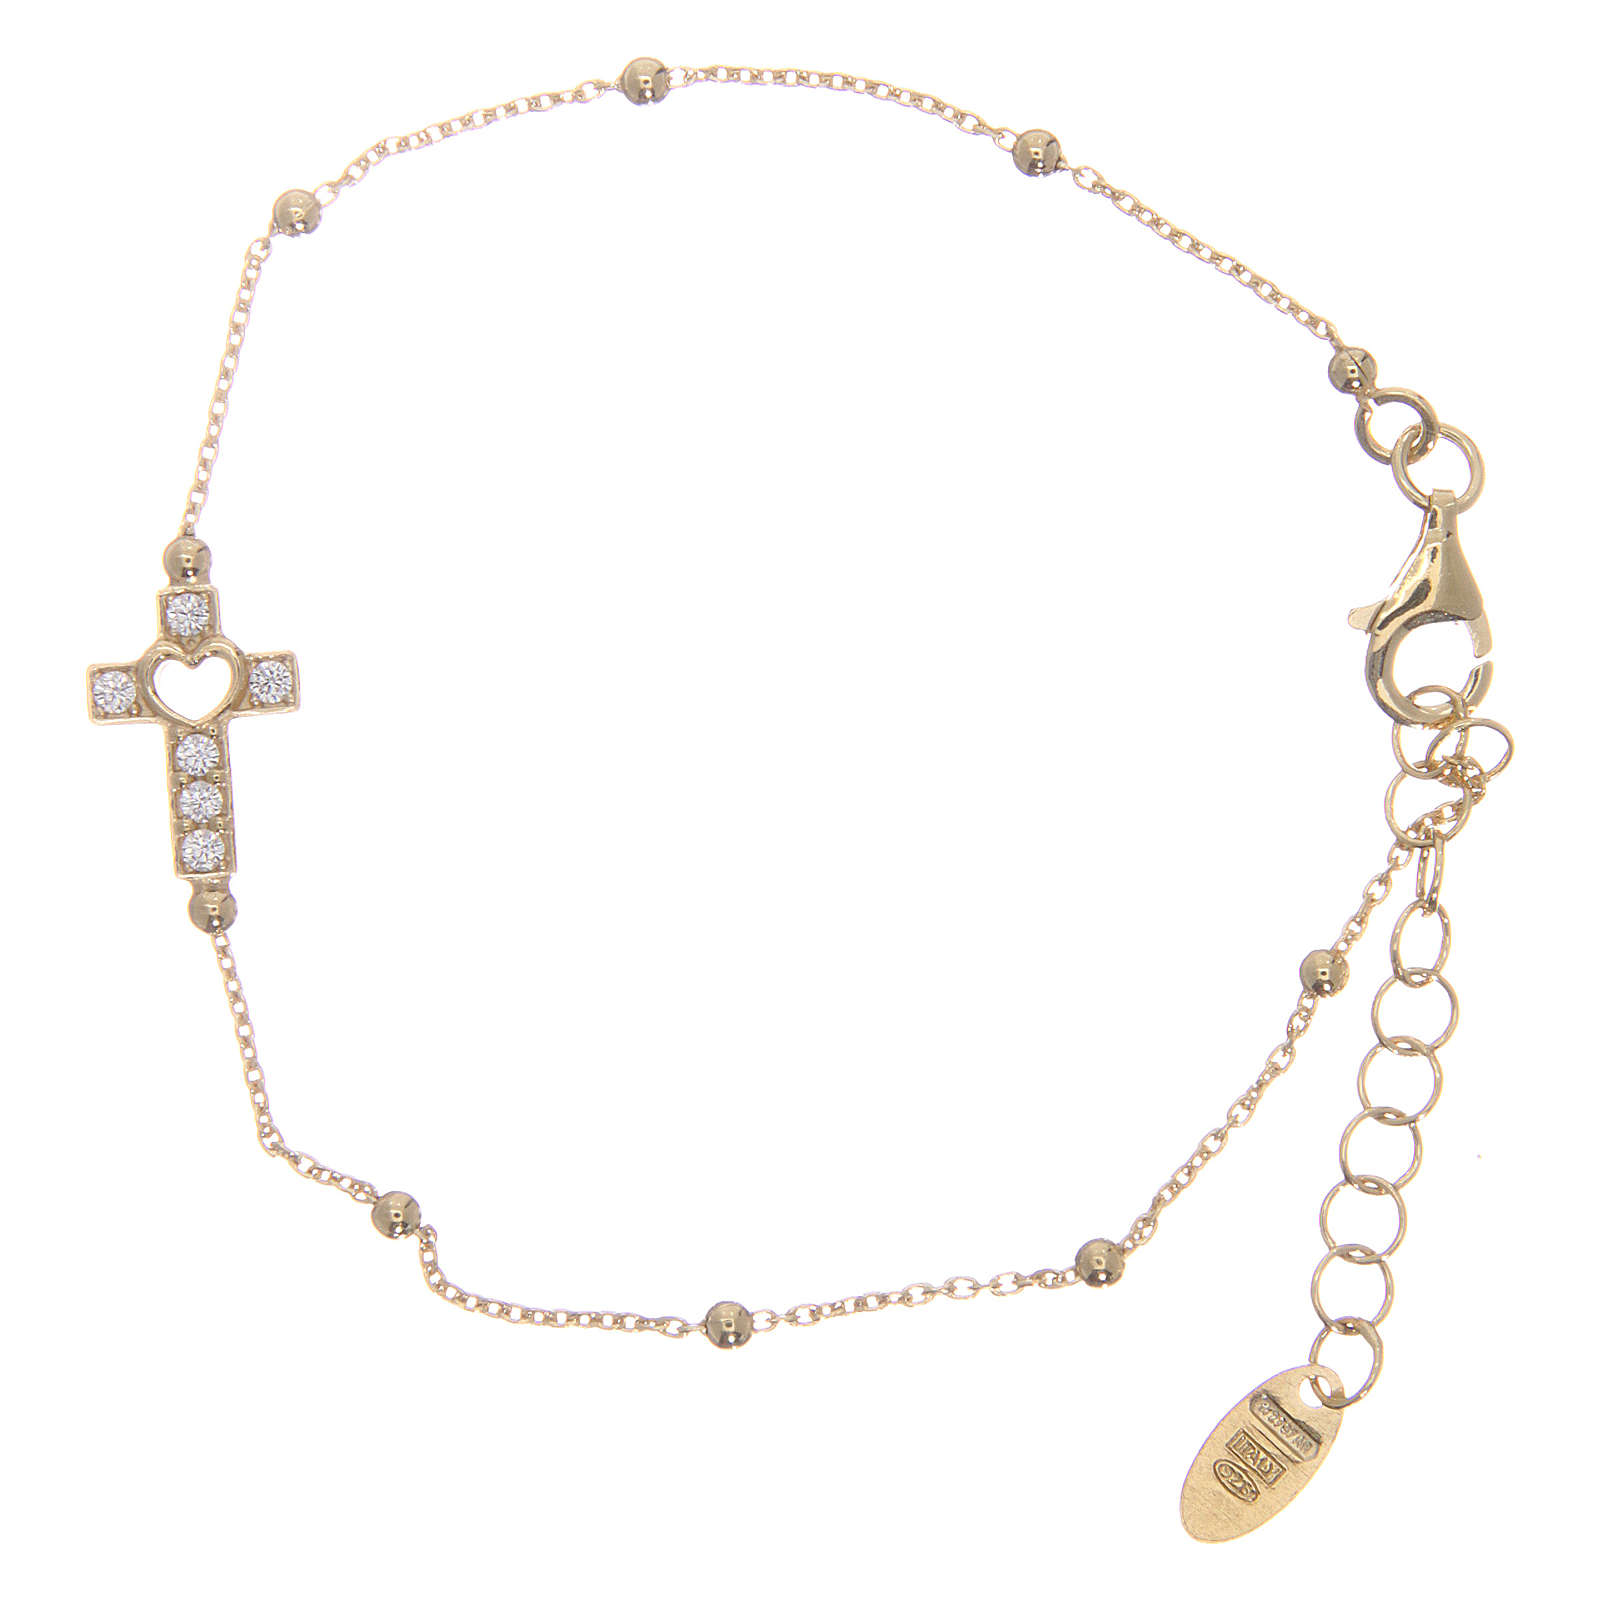 Armband AMEN vergoldeten Silber 925 Kreuz weissen Zirkonen 4